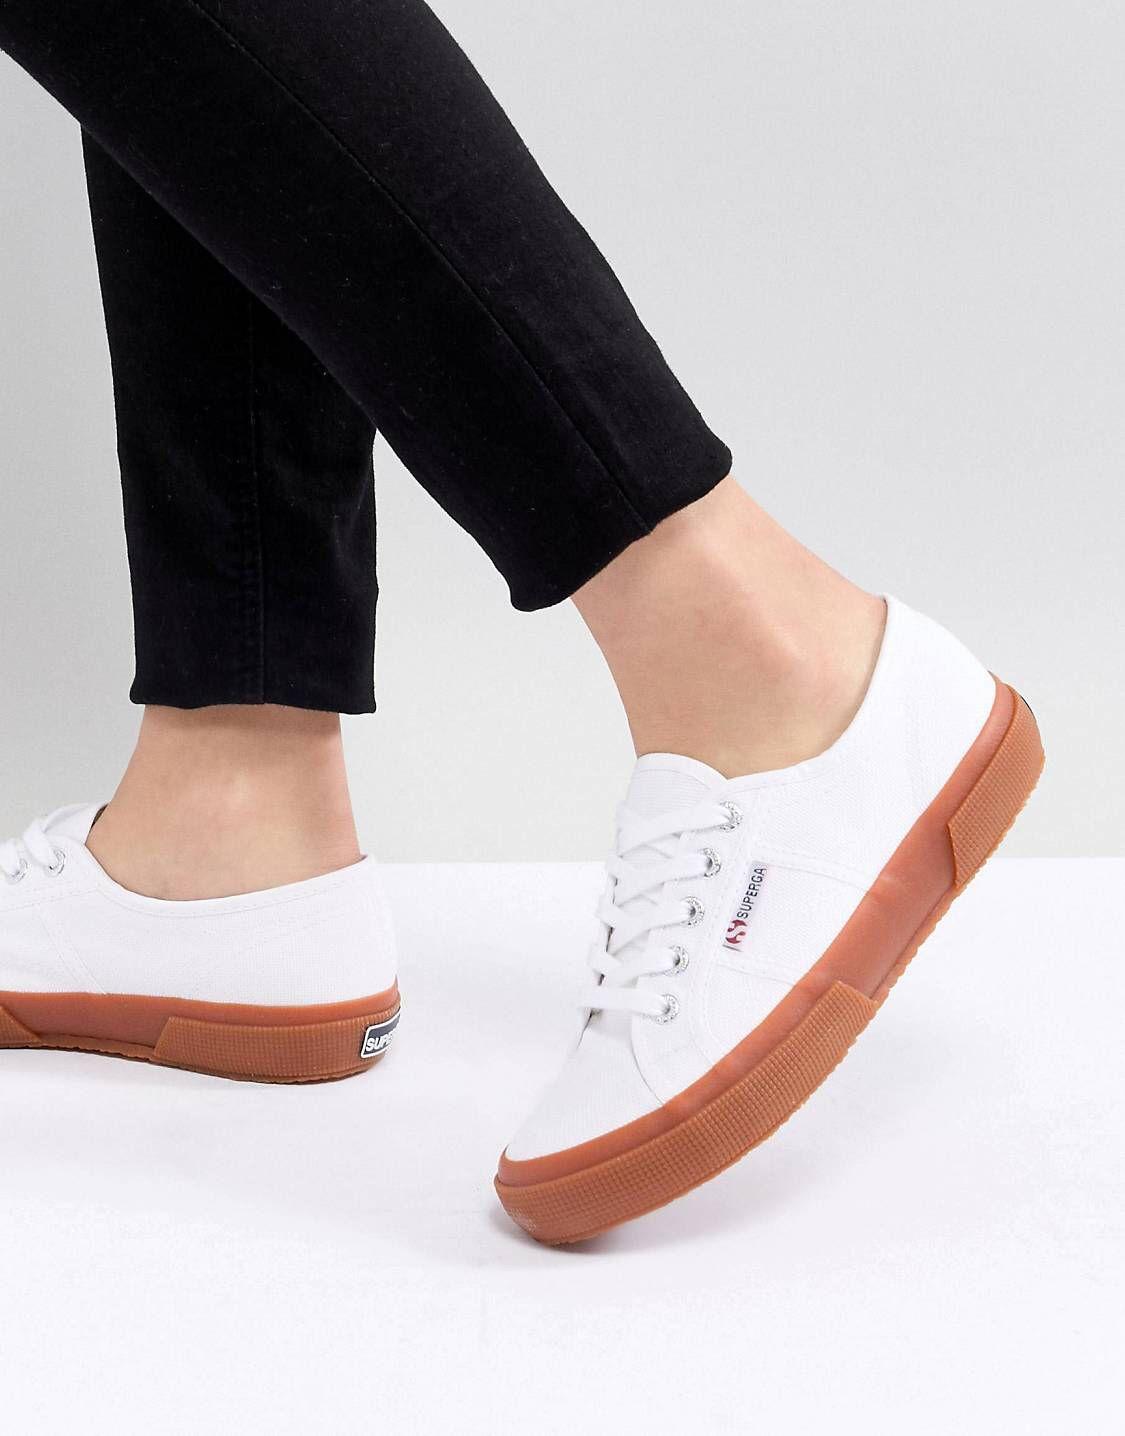 Superga white sneakers, Sneakers, Superga